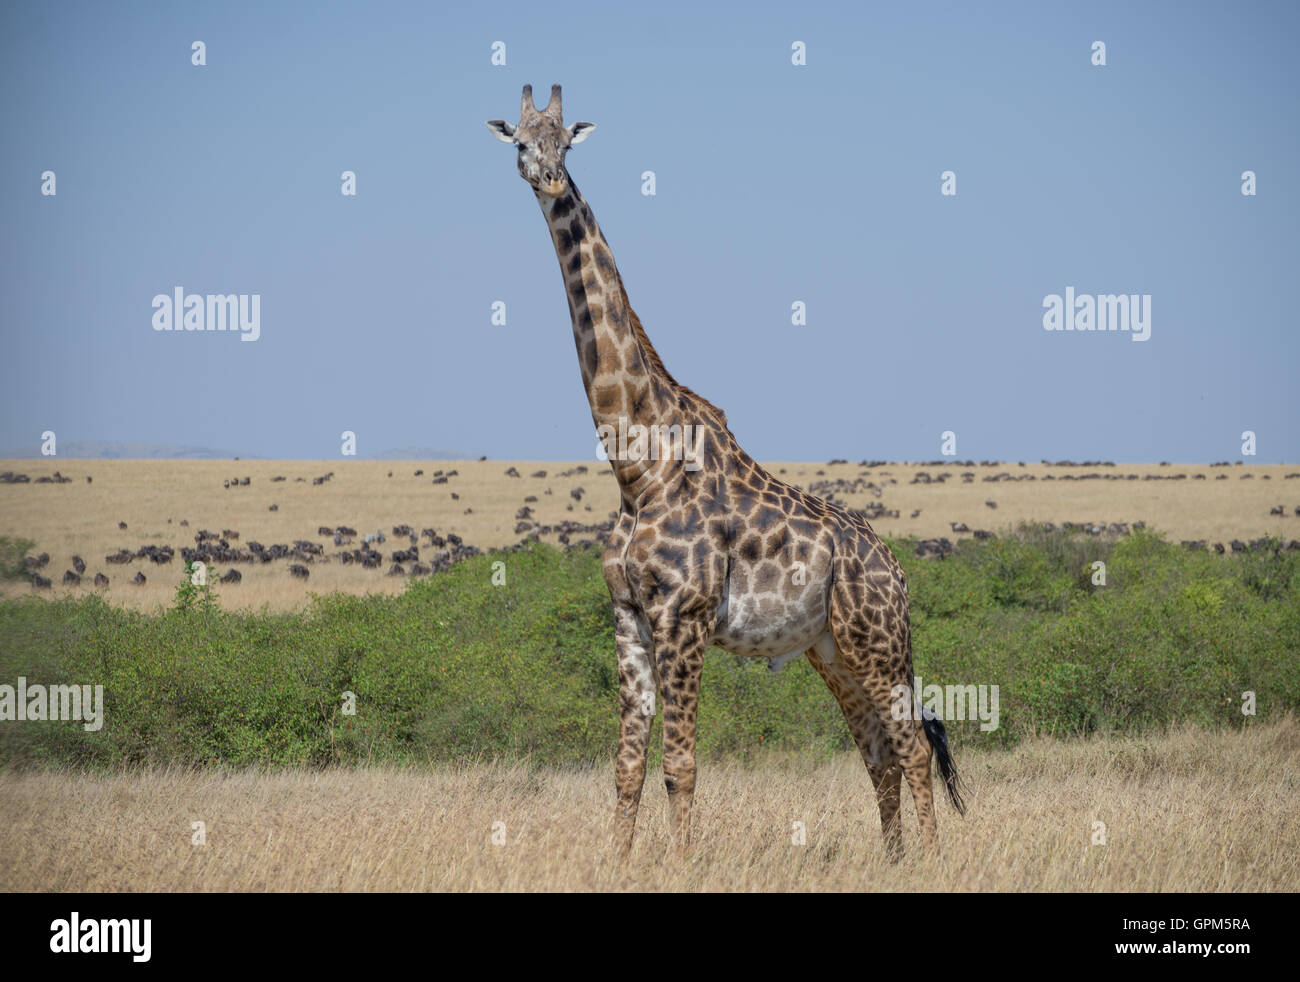 Giraffes in Masai Mara National Reserve in Kenya , Africa Stock Photo